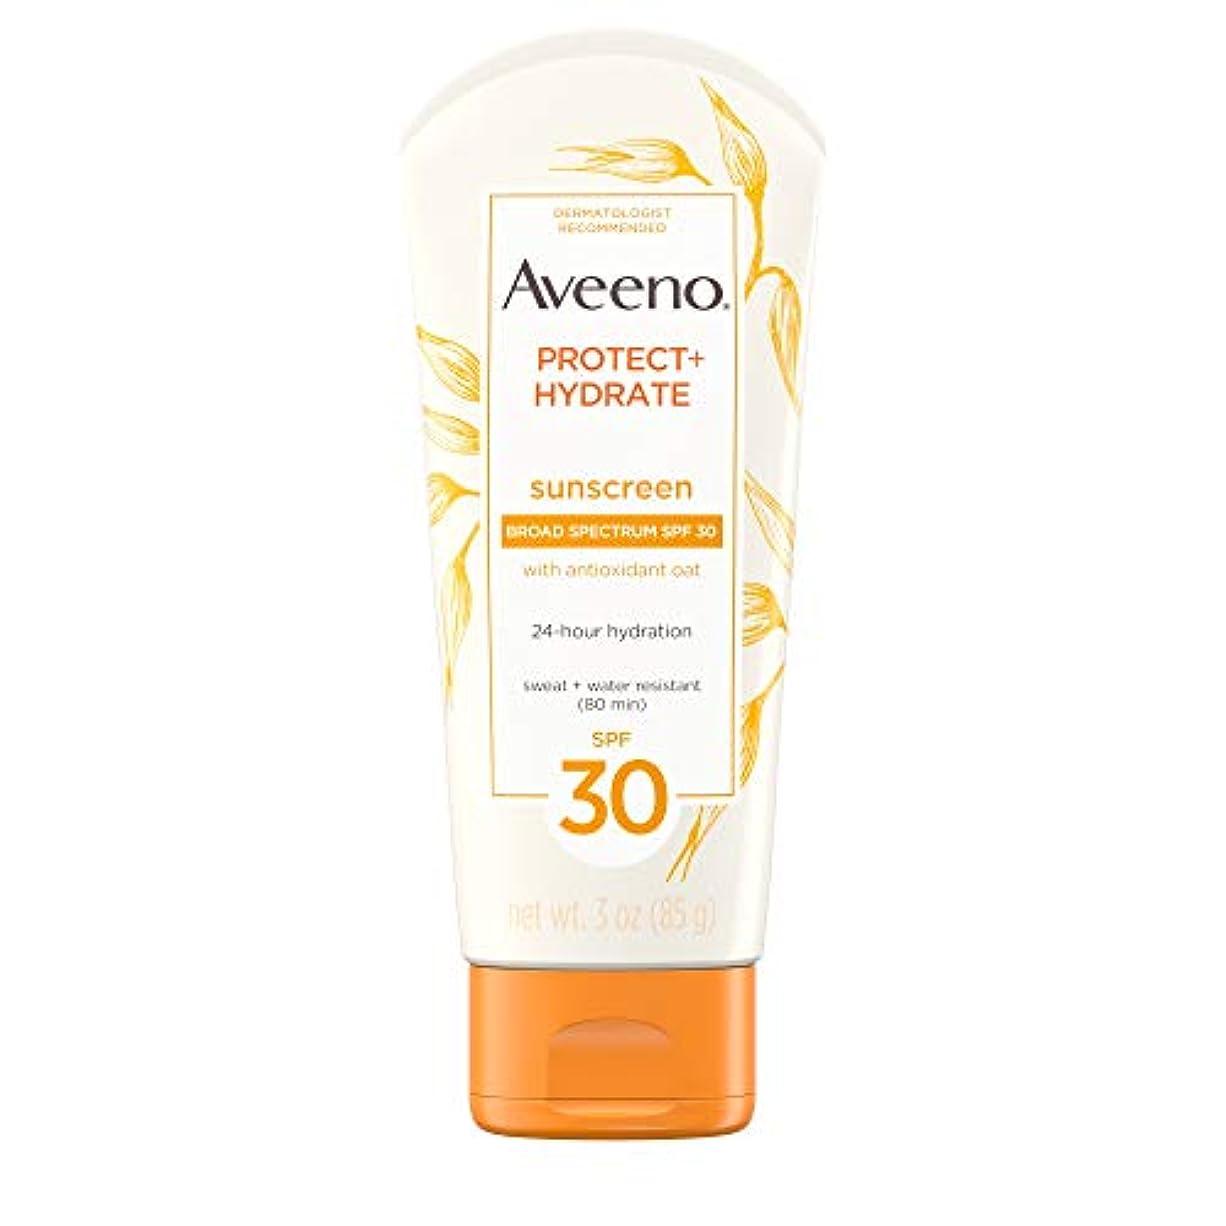 Aveeno アビーノ 日焼け止め ローションSPF-30 protect+hydrate Sunscreen Lotion(平行輸入品) 85g (3Oz)